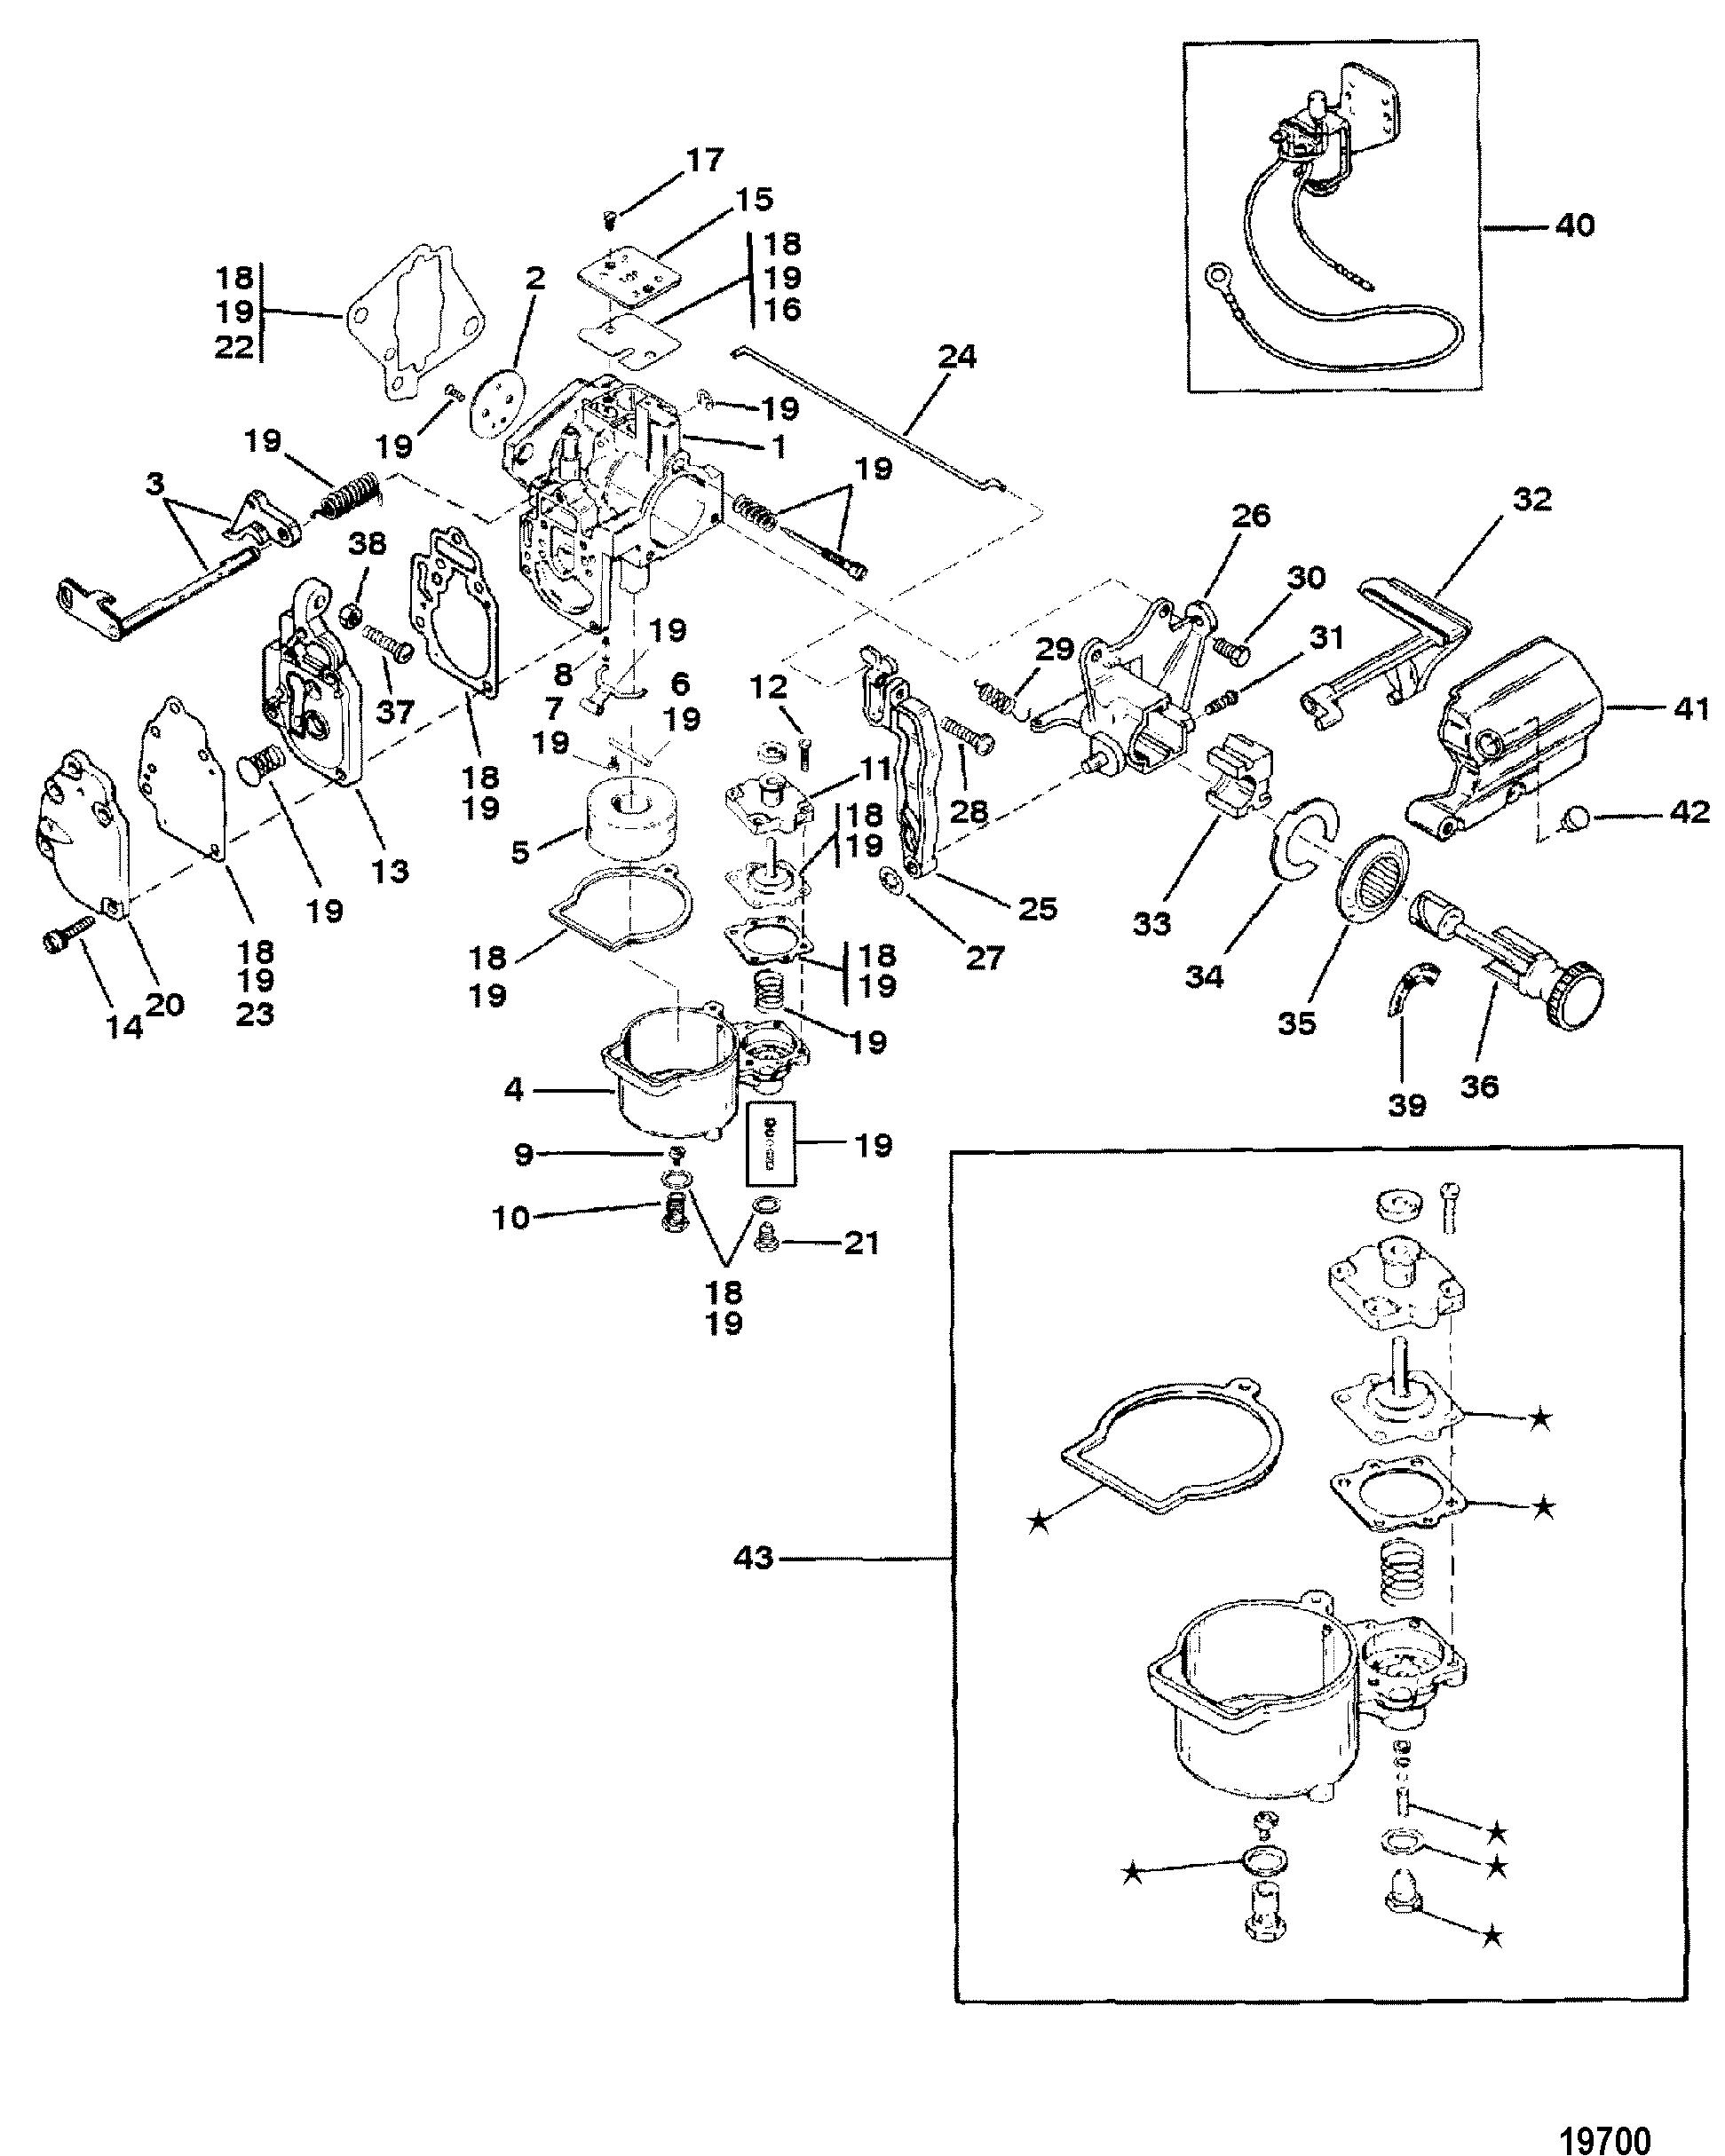 diagram of p.8 mercury motor carb 9 9 15 usa s n 0g112450 bel s n 9831800  amp  up for  carb 9 9 15 usa s n 0g112450 bel s n 9831800  amp  up for